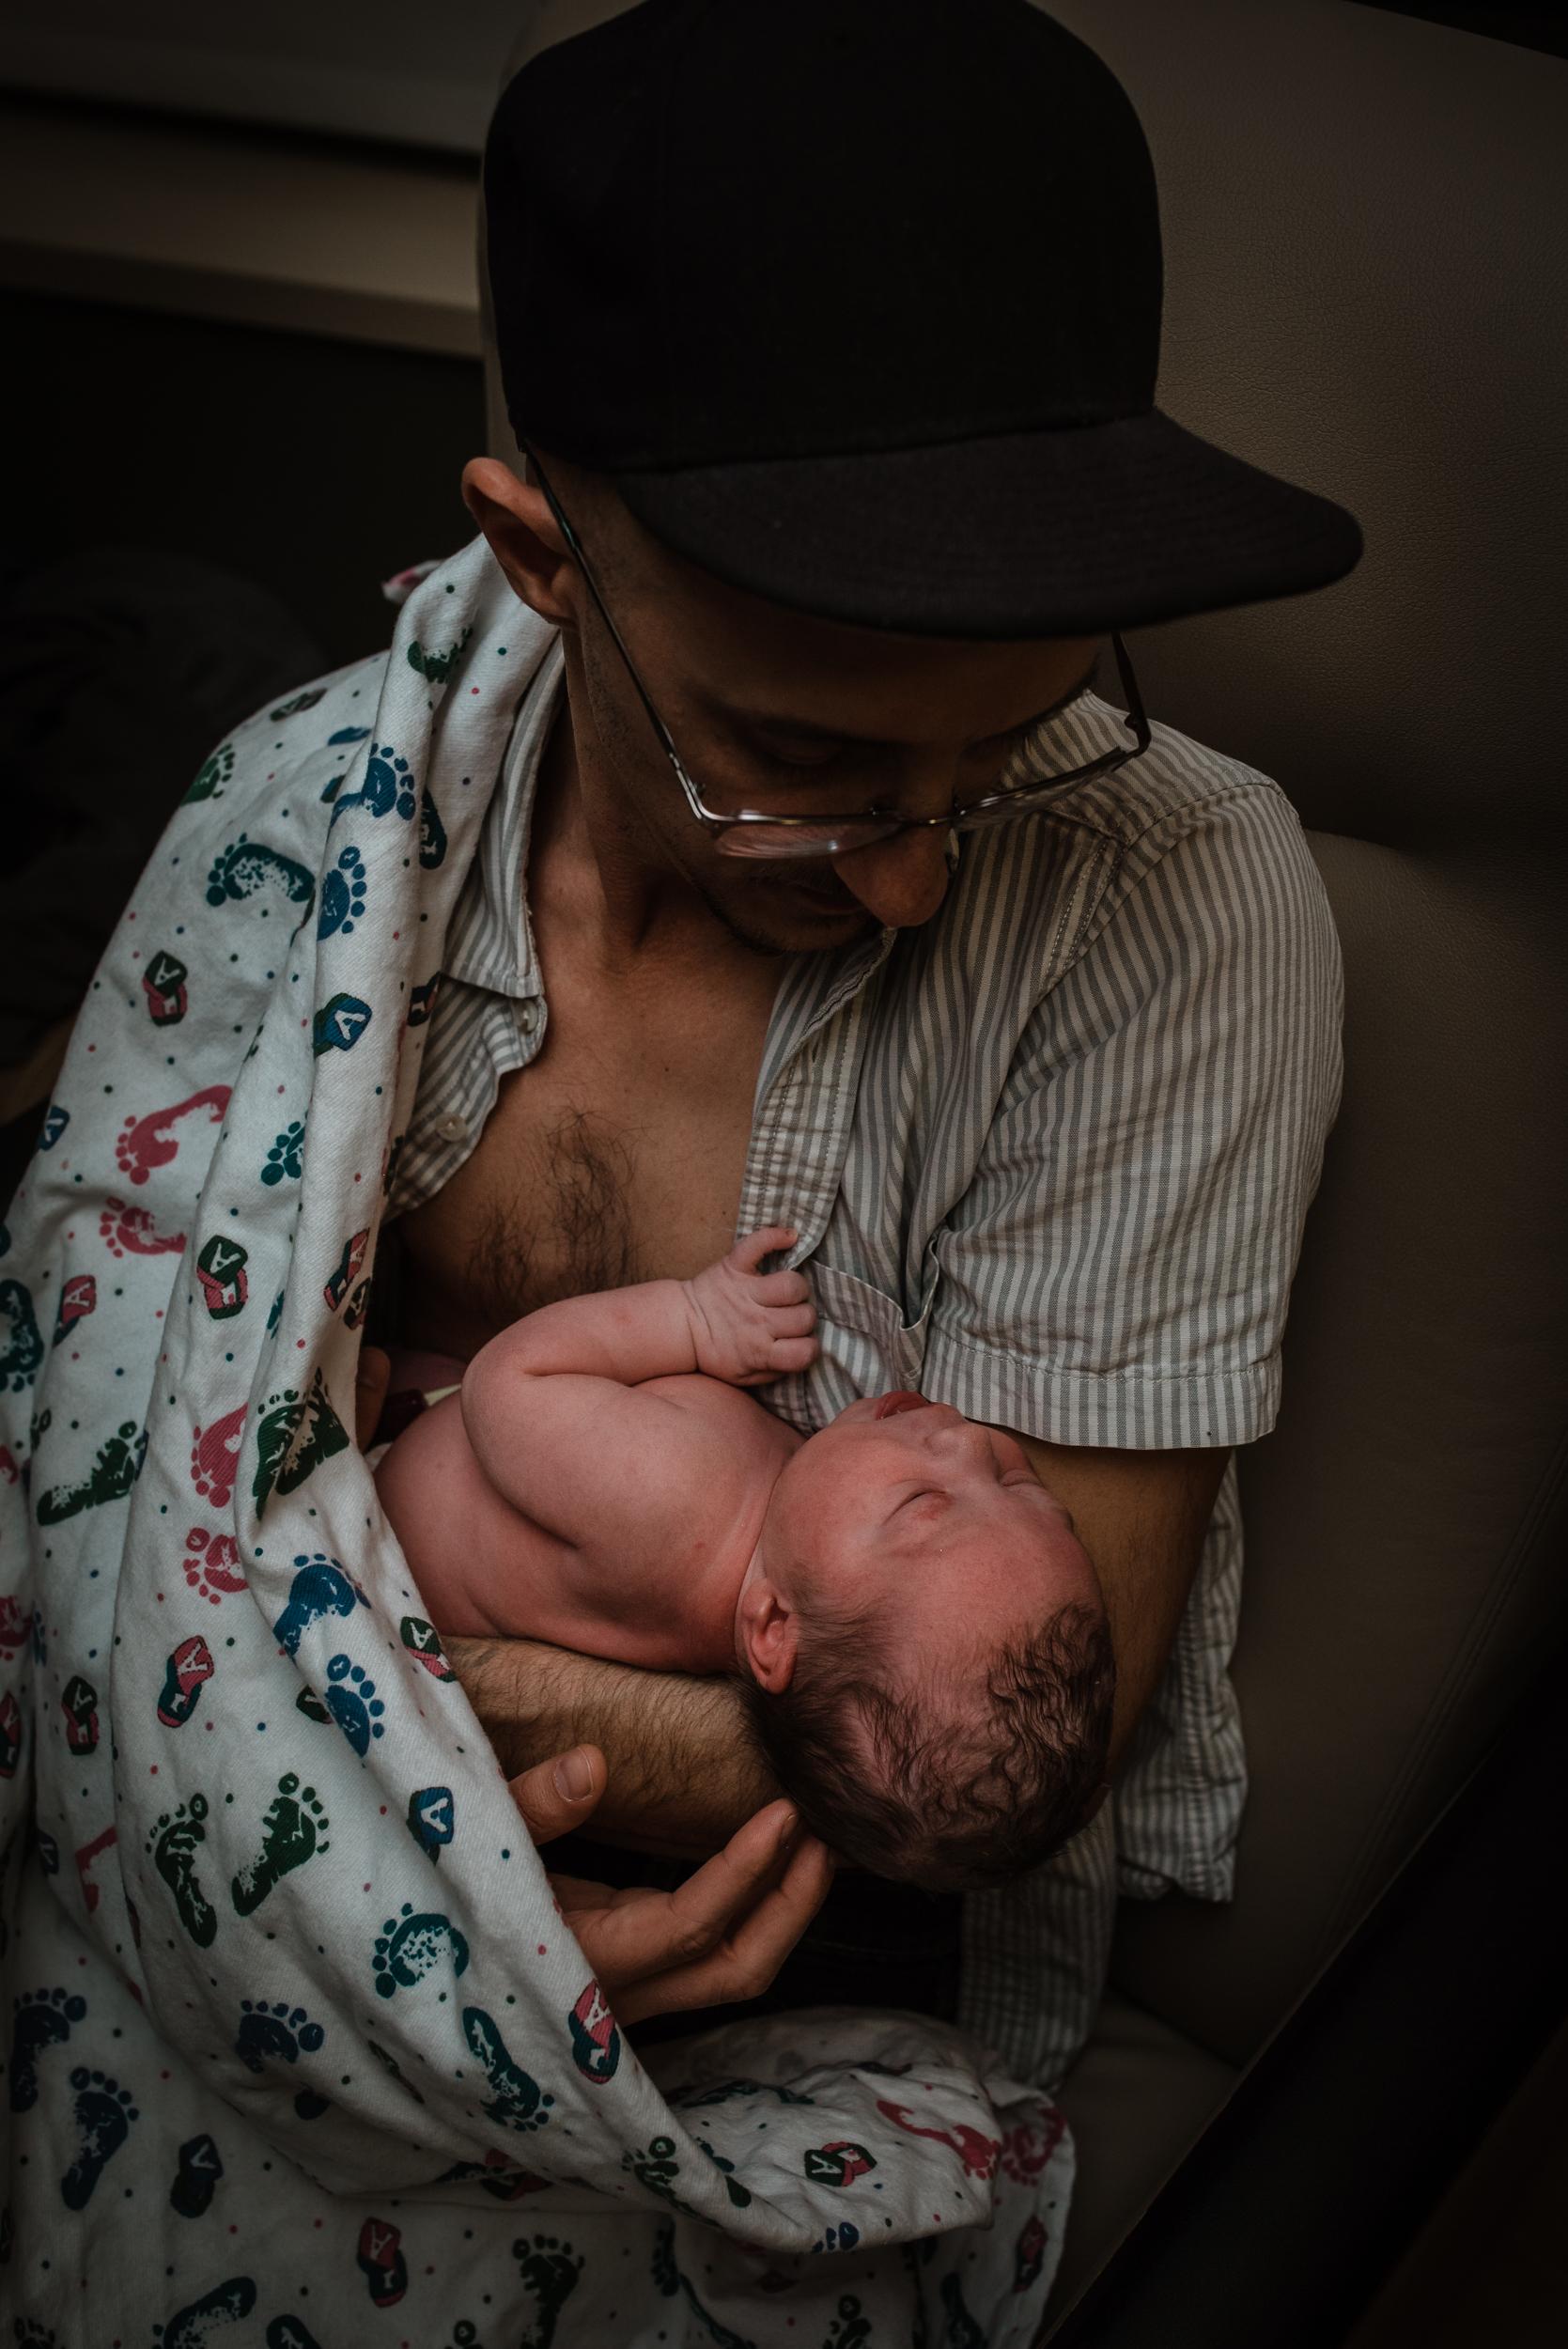 Best Birth Photography Minneapolis St. Paul Minnesota Meredith Westin-November 04, 2018-213235.jpg